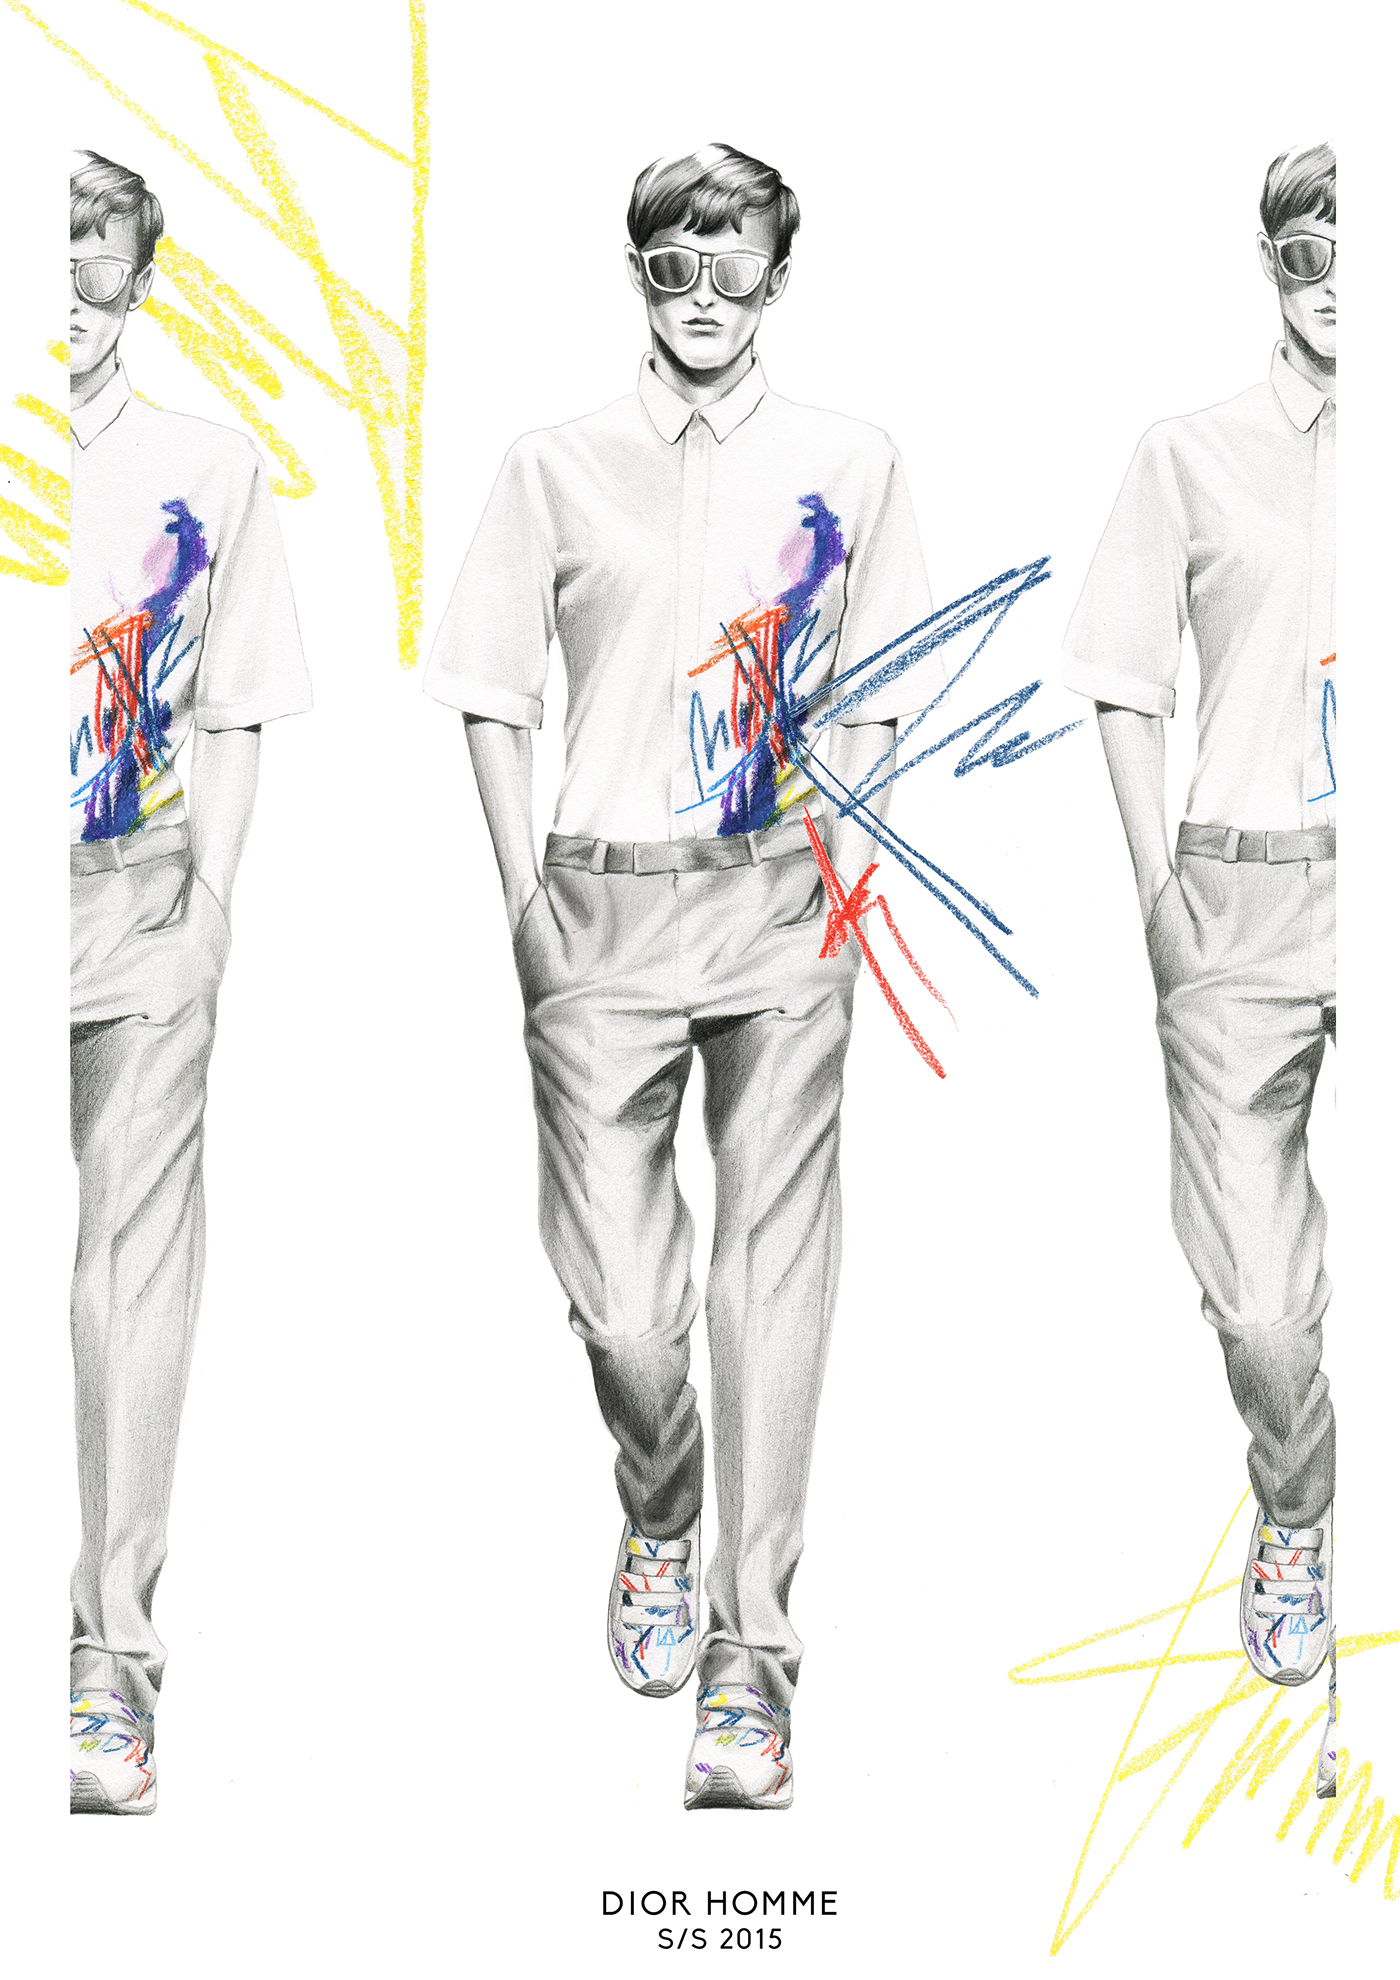 hautecouture fashionweek catwalk runway JeanPaulGaultier VERSACE Dior Menswear portrait fashionillustration sketch art